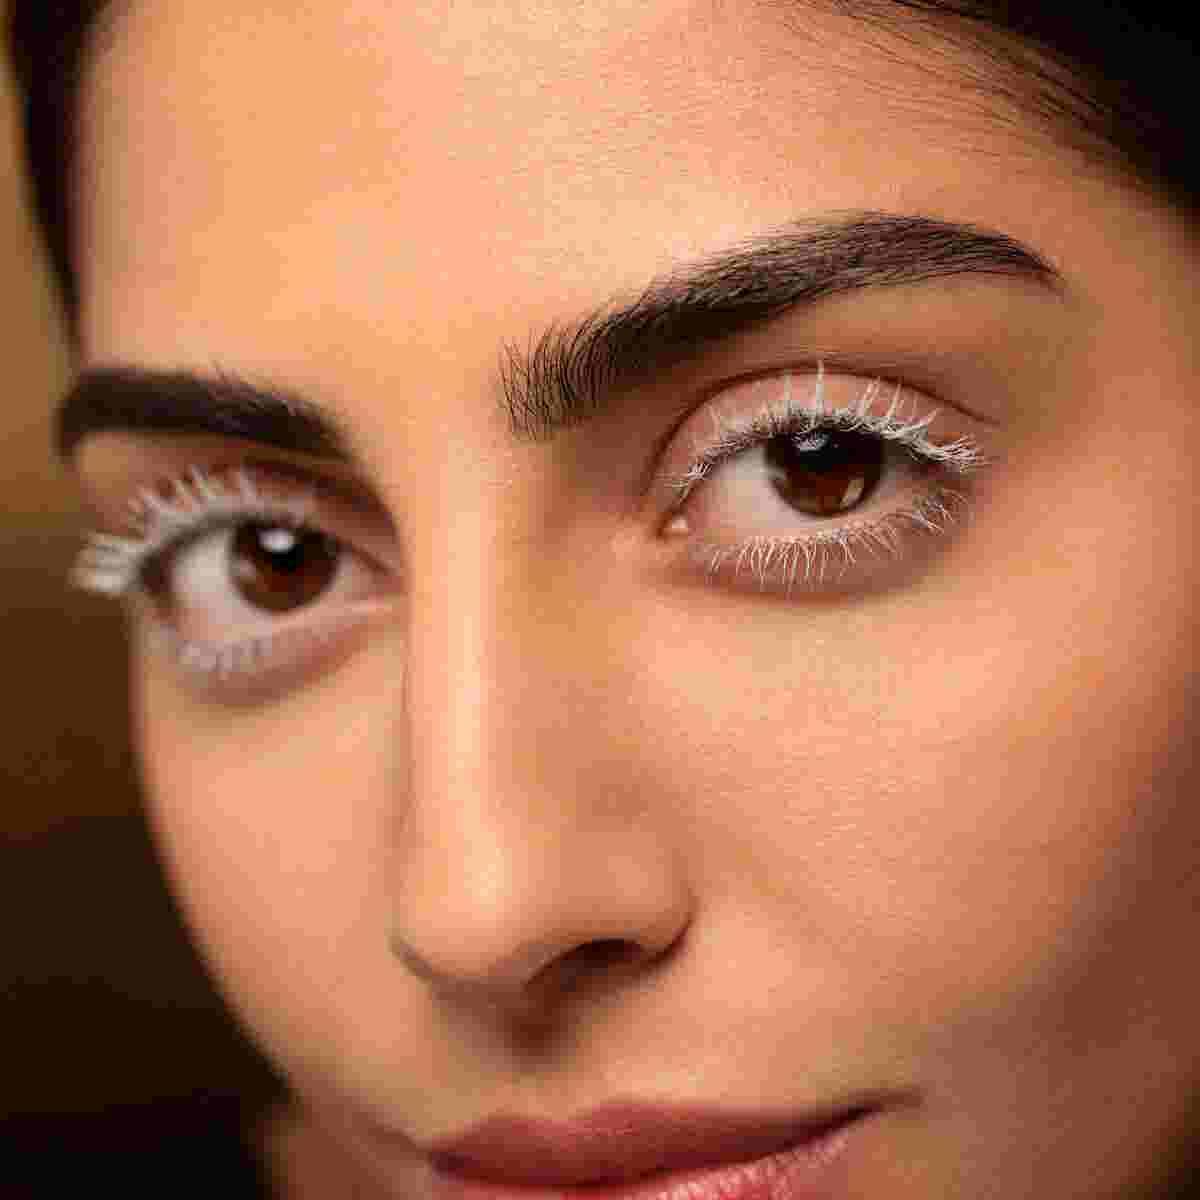 Model wearing eyelash primer by Max Factor